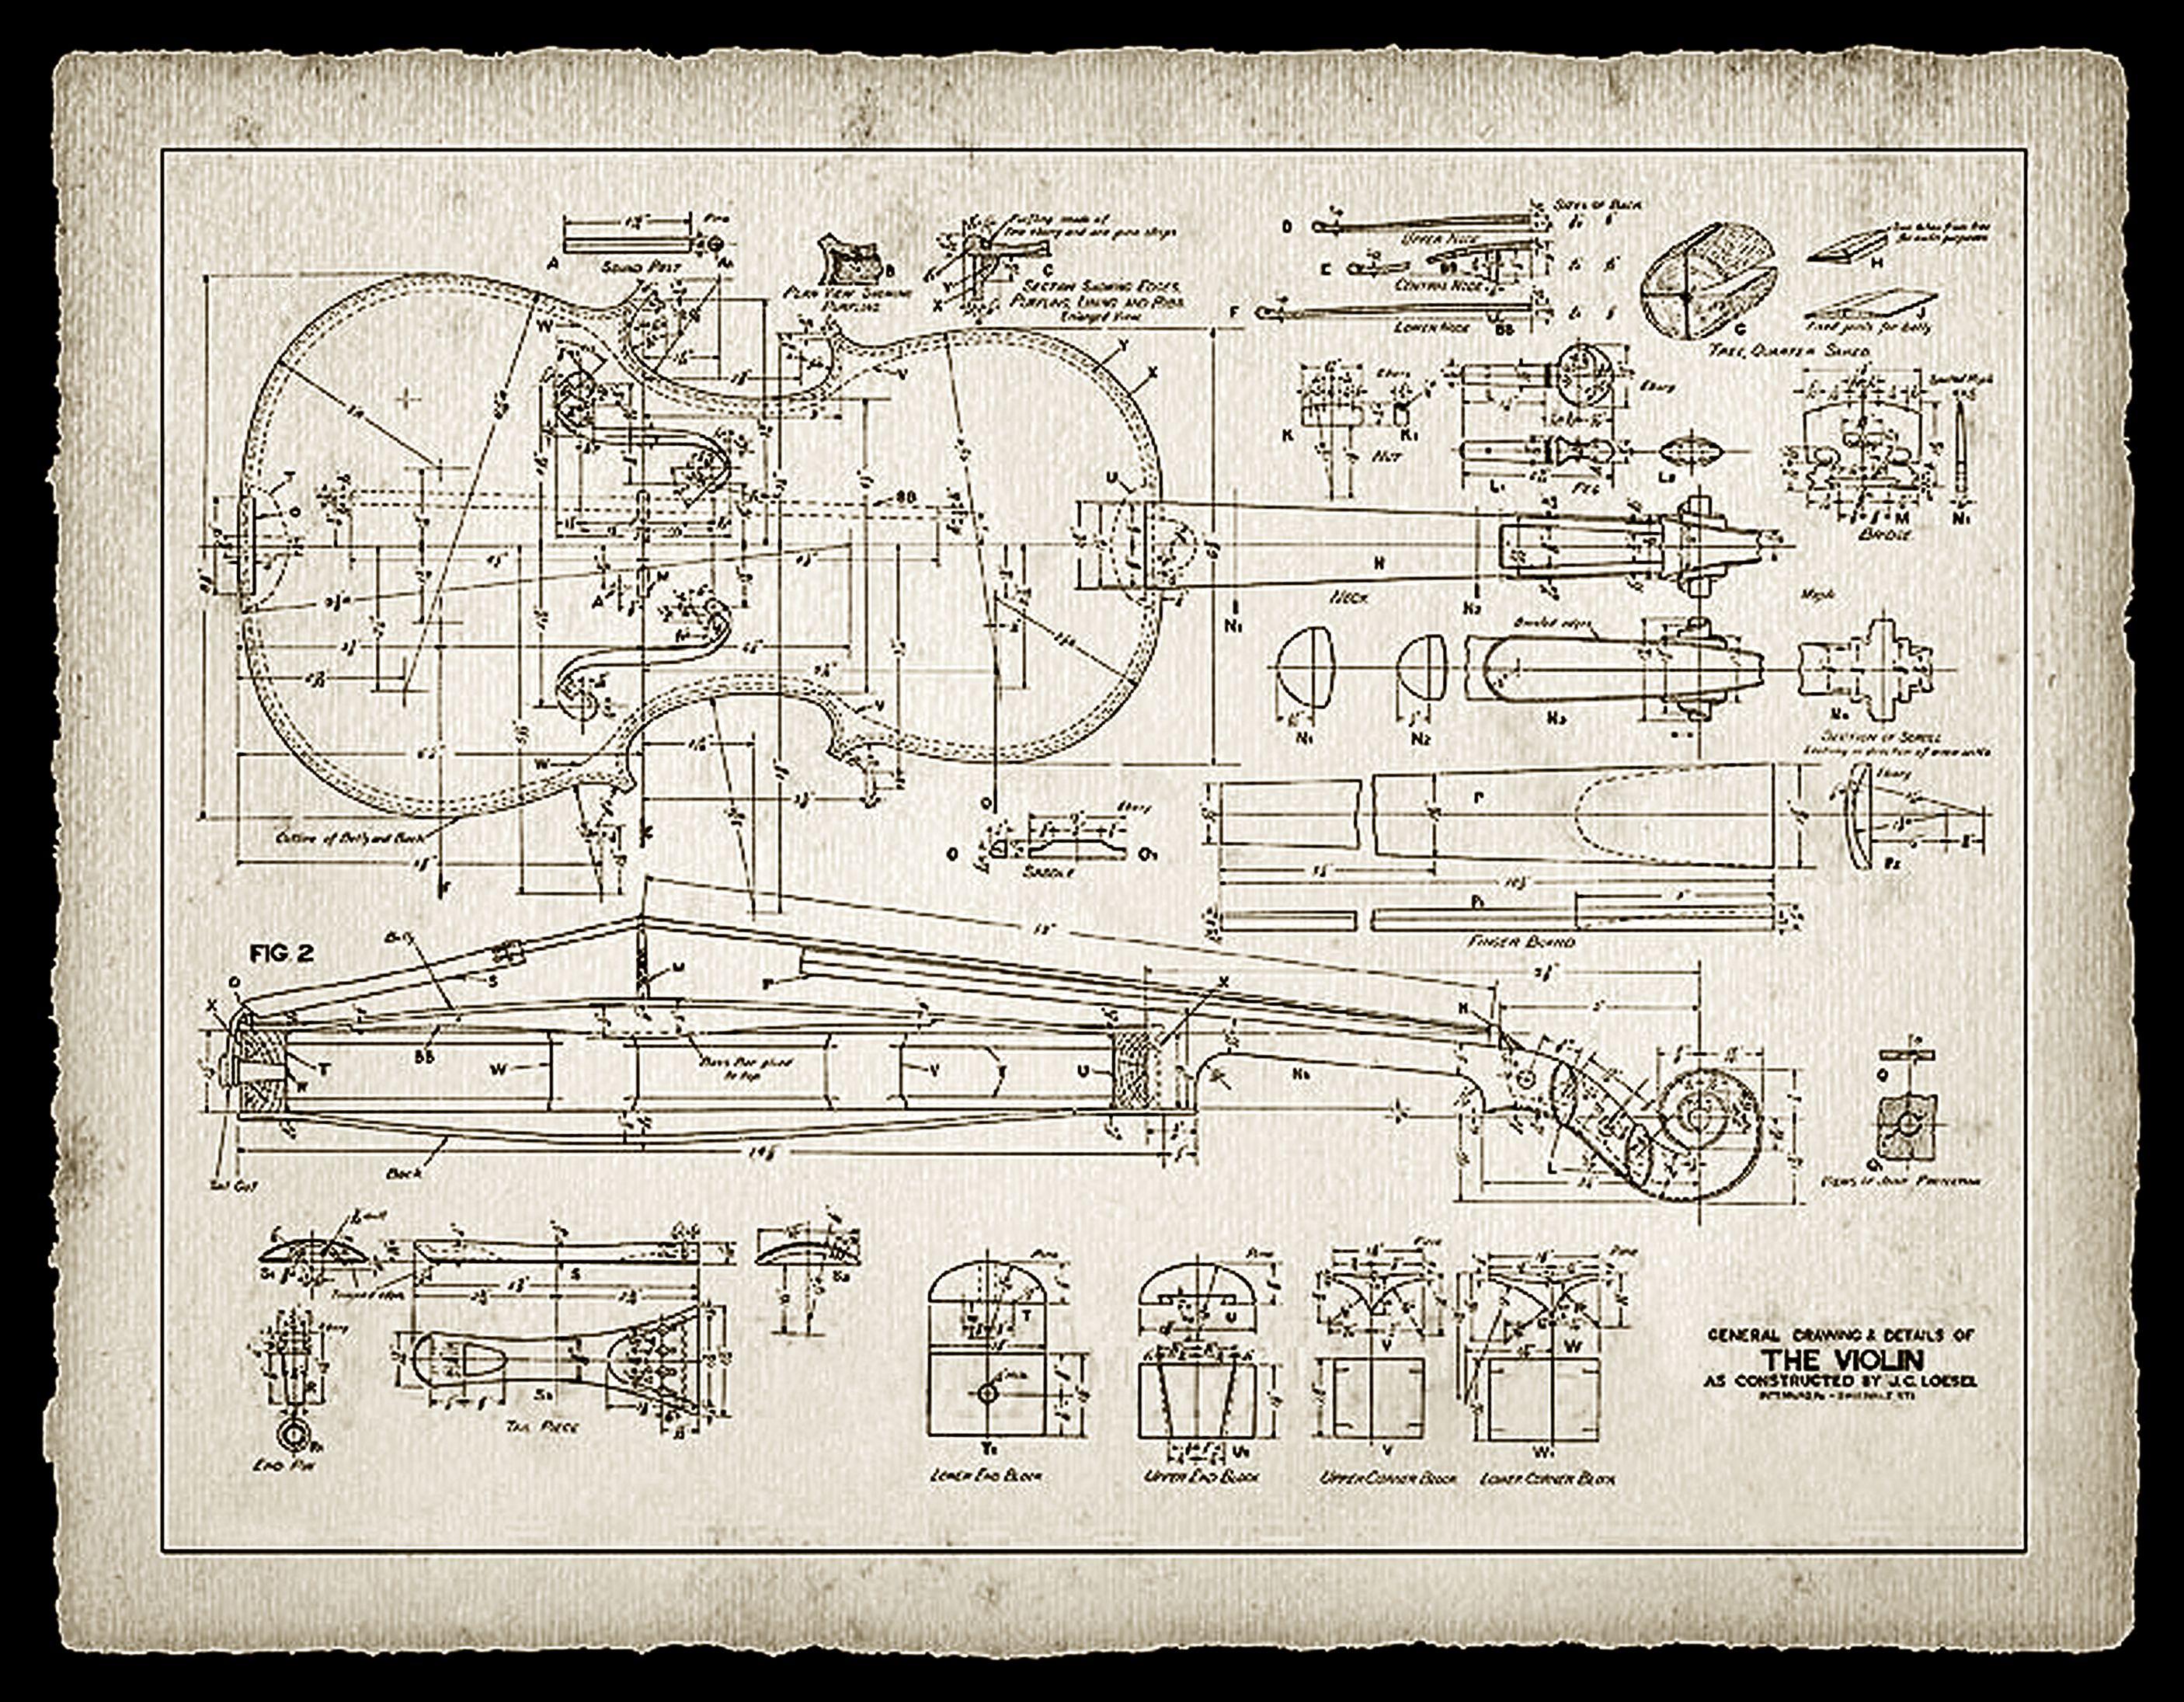 Guitar Wall Murals Print Of A 19th Century Violin Maker S Plans ά